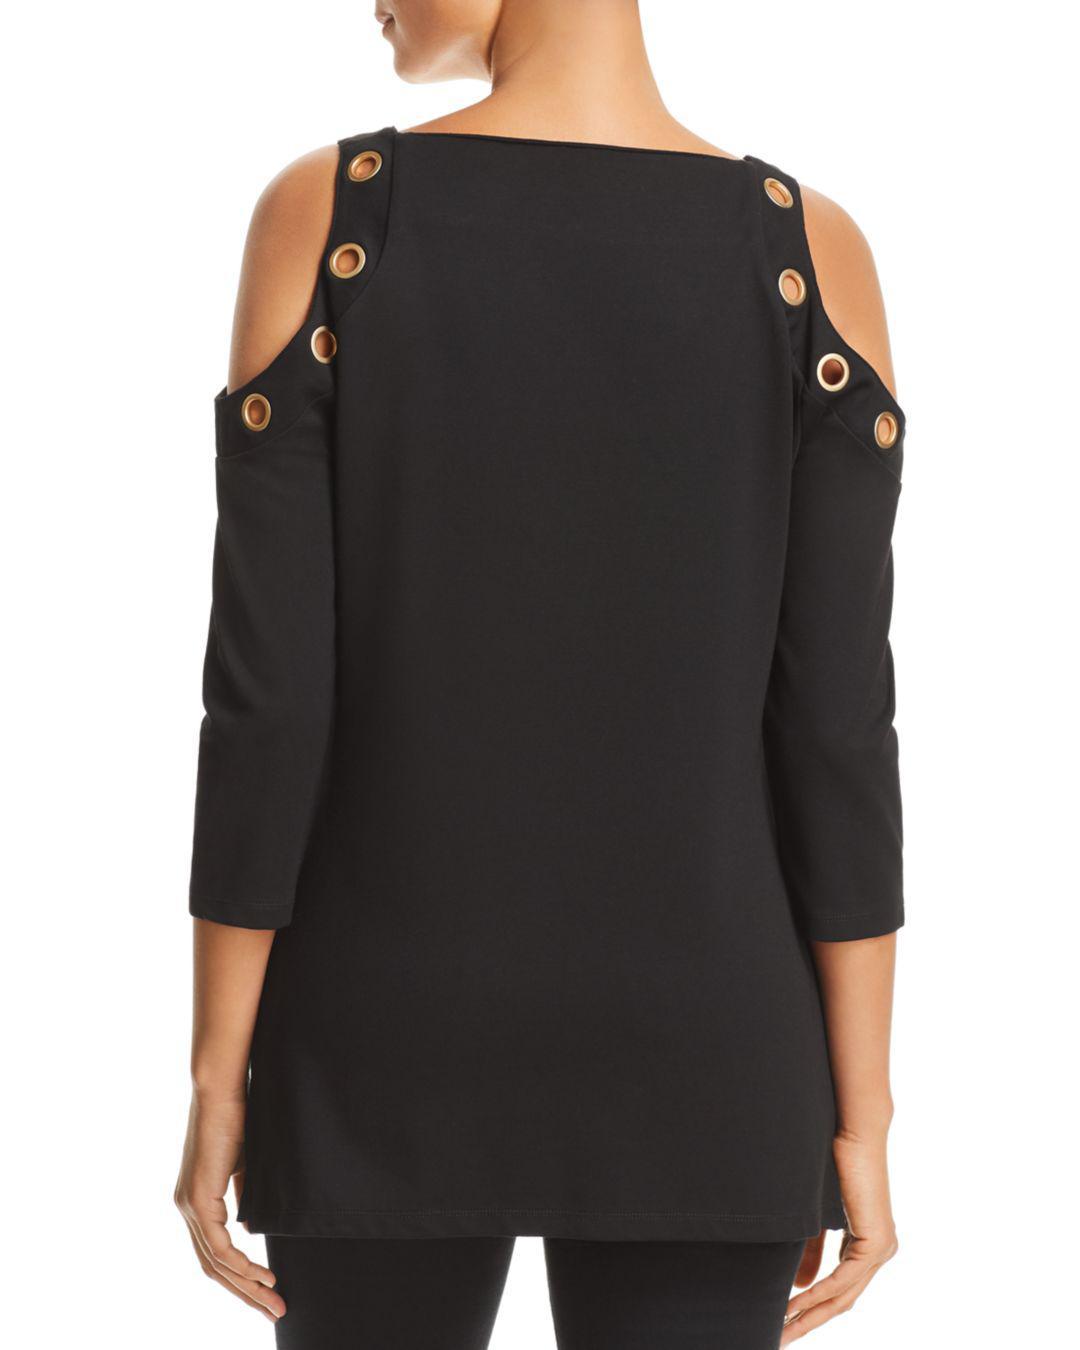 71748a89cc2d39 Lyst - Donna Karan Grommet Detail Cold-shoulder Blouse in Black